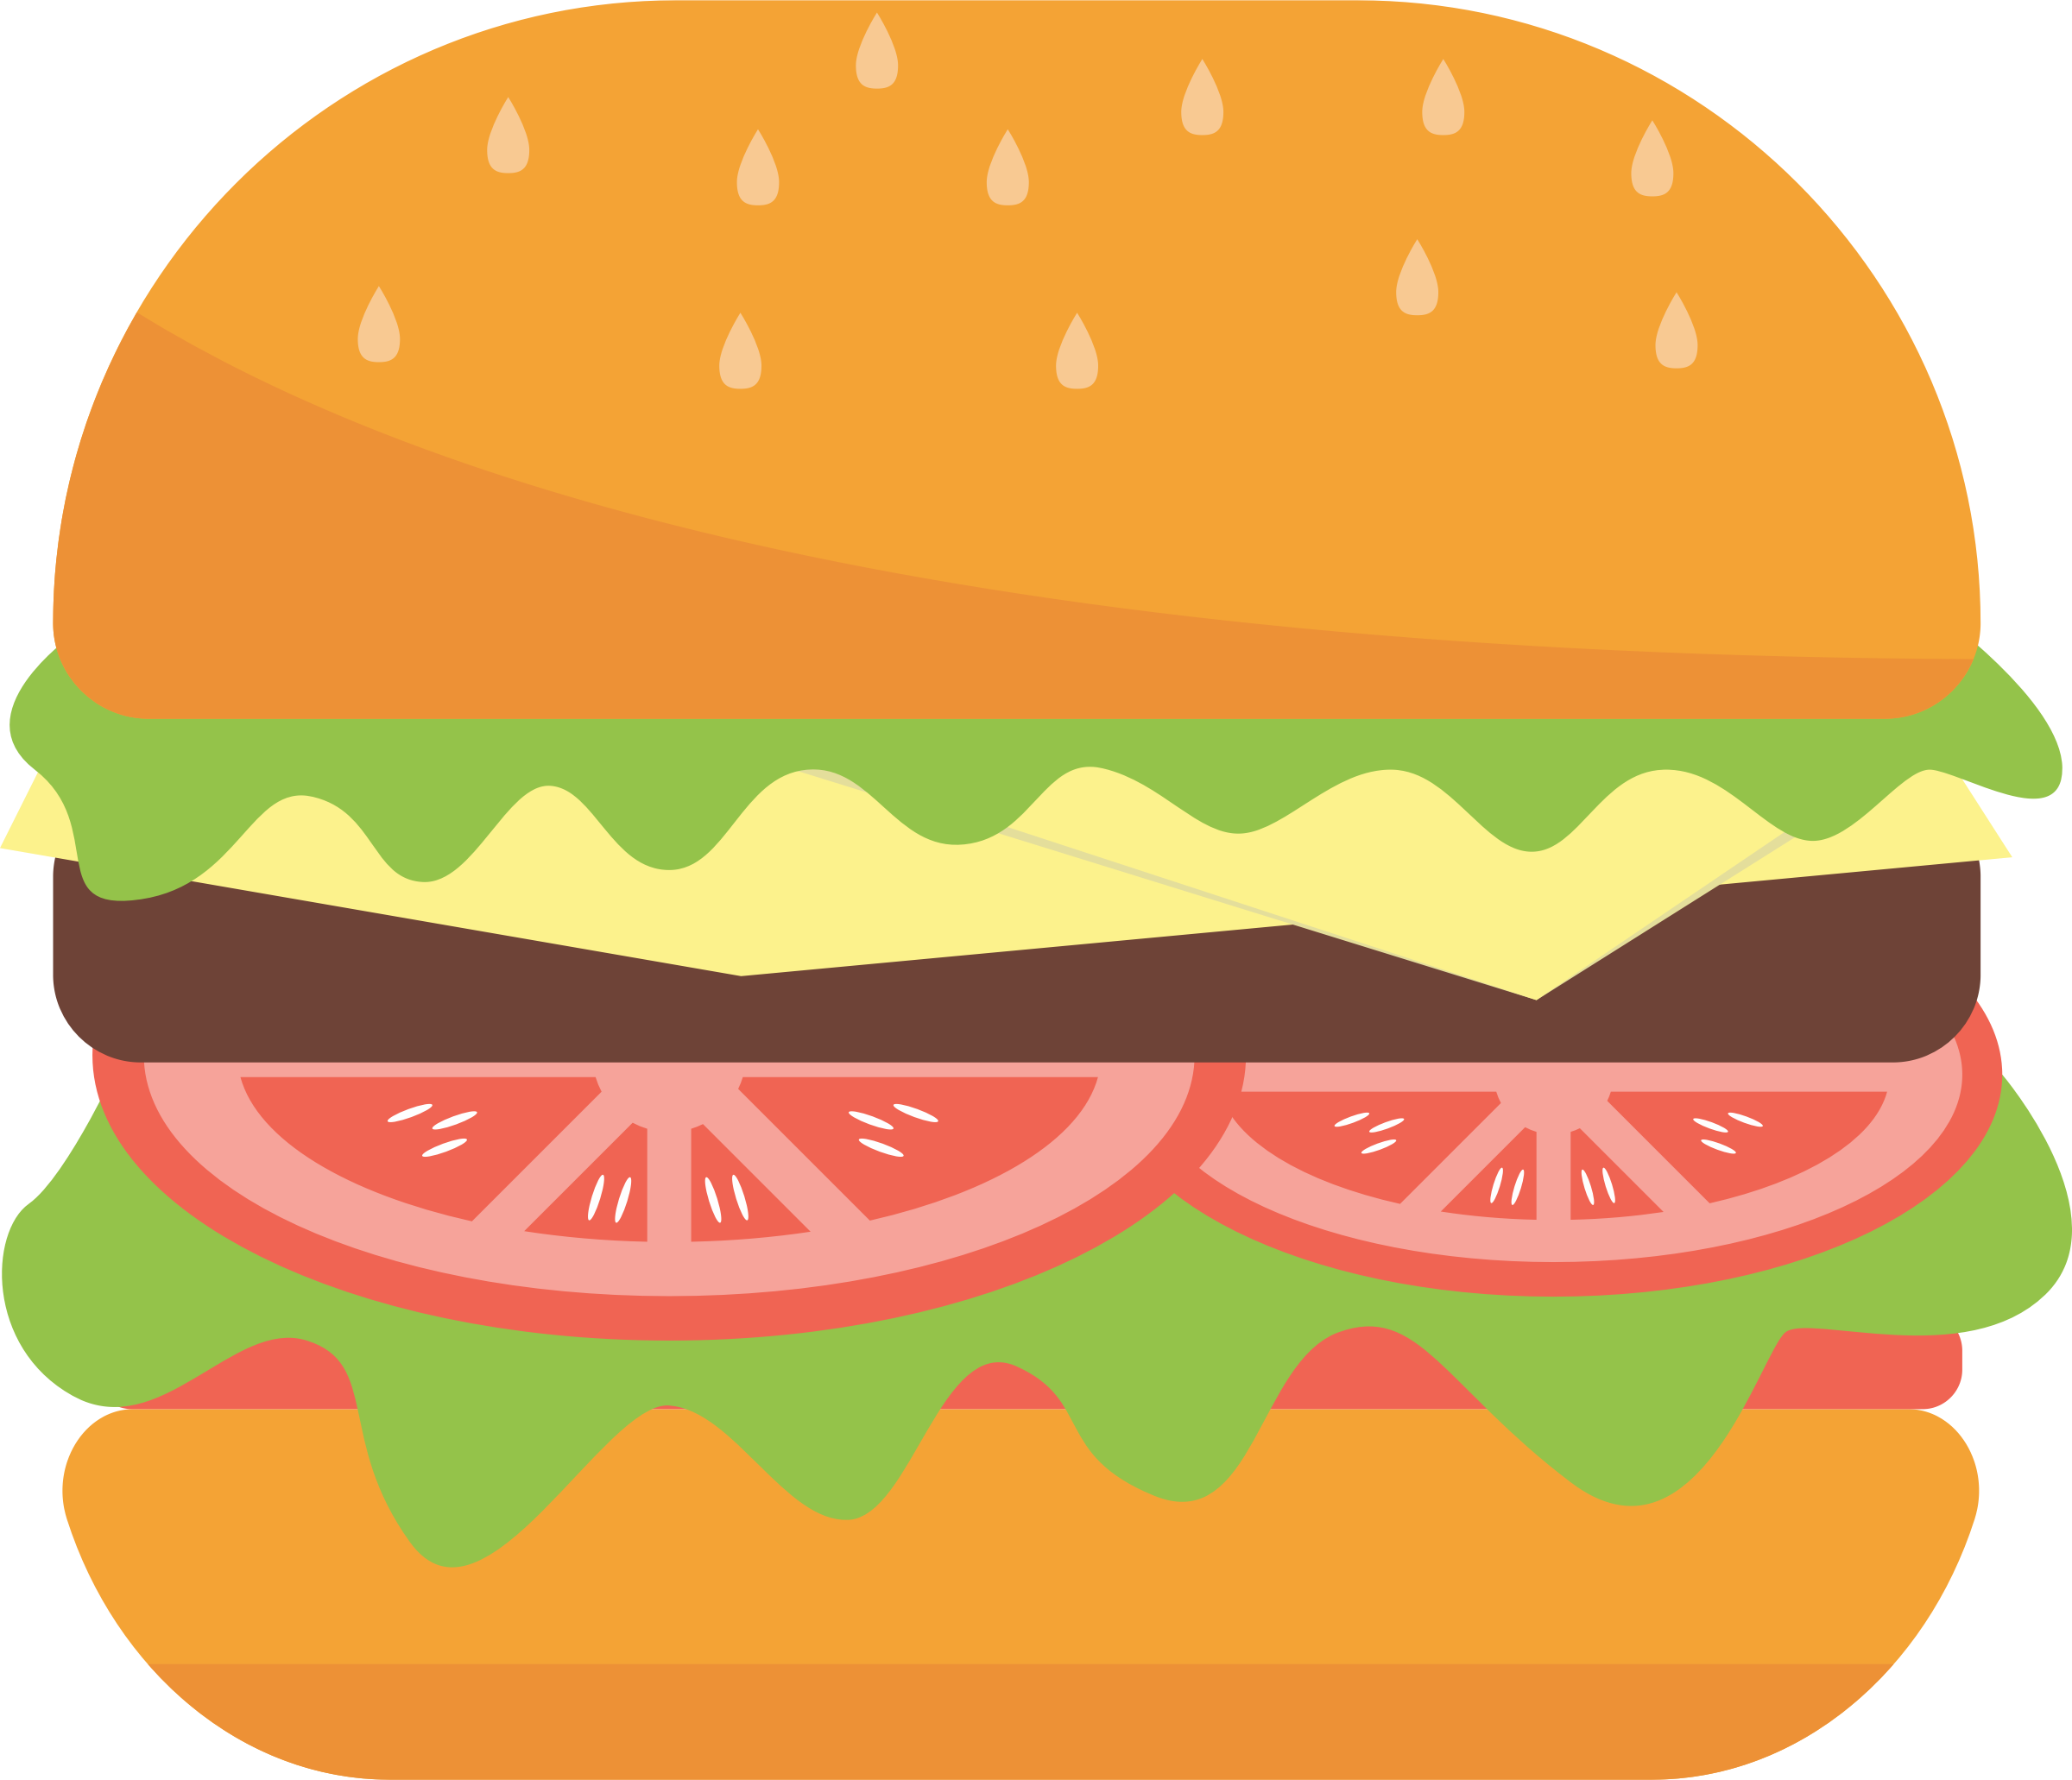 Food clipart hamburger. Big image png